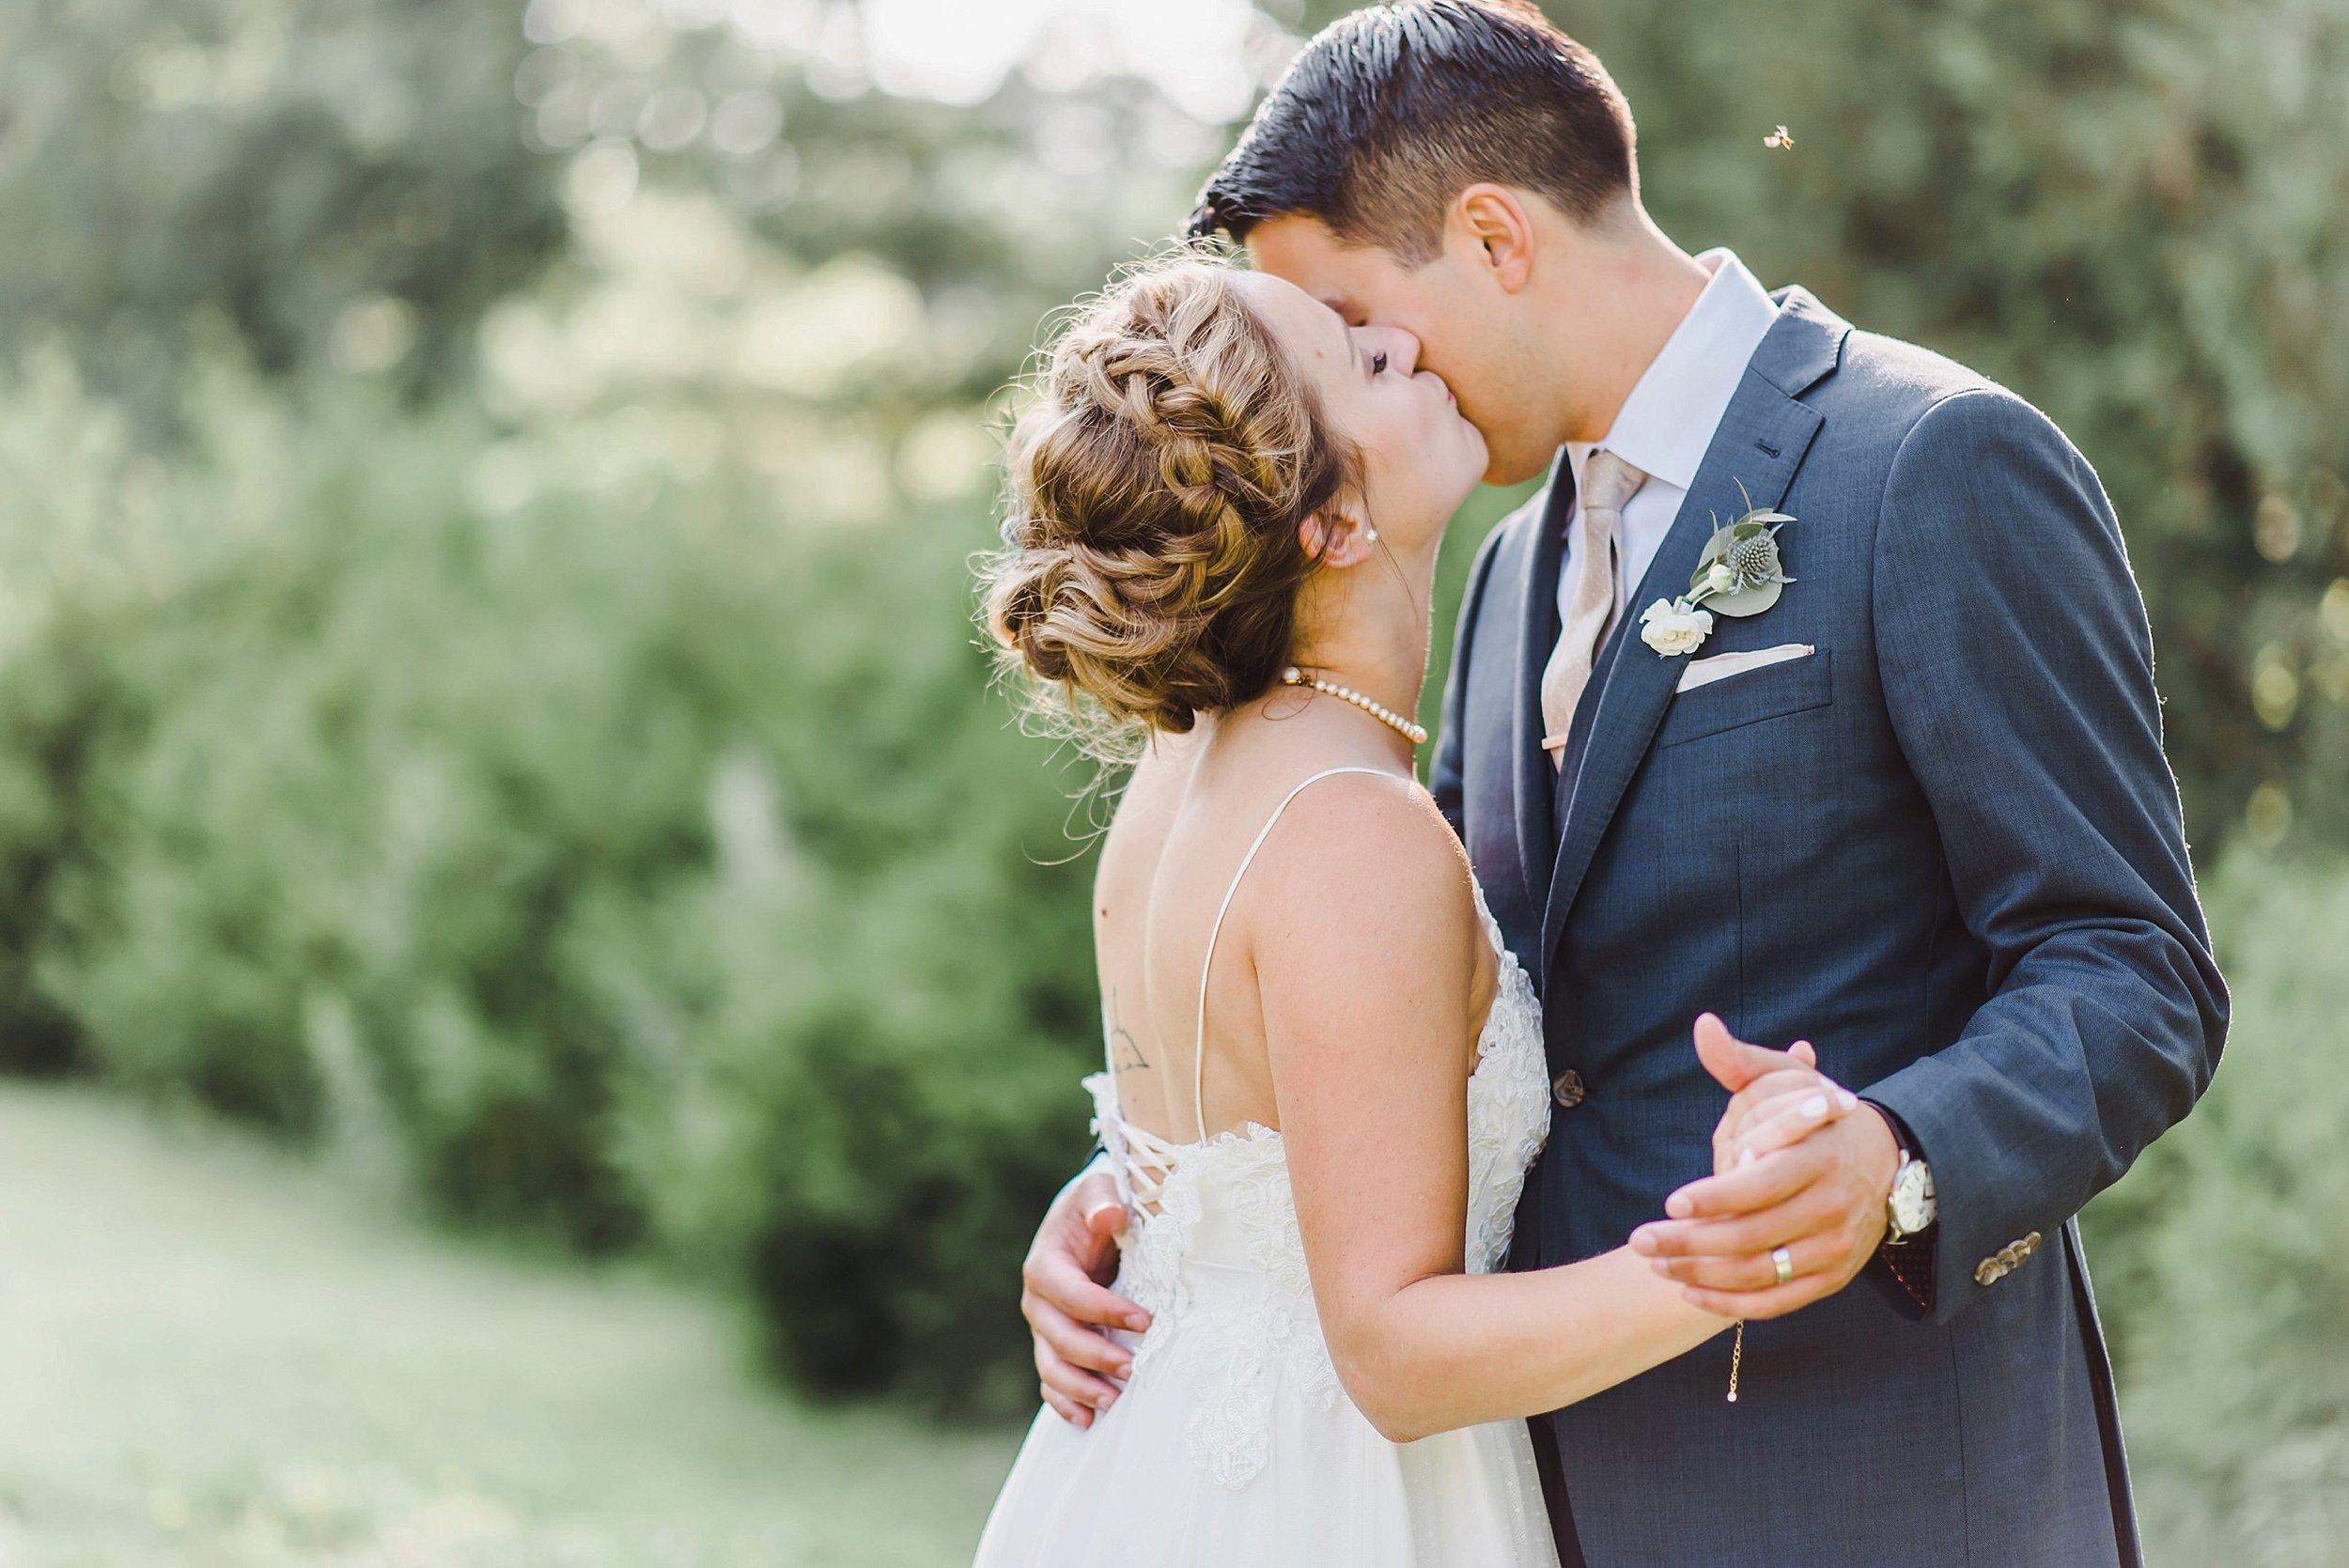 light airy indie fine art ottawa wedding photographer | Ali and Batoul Photography_0853.jpg